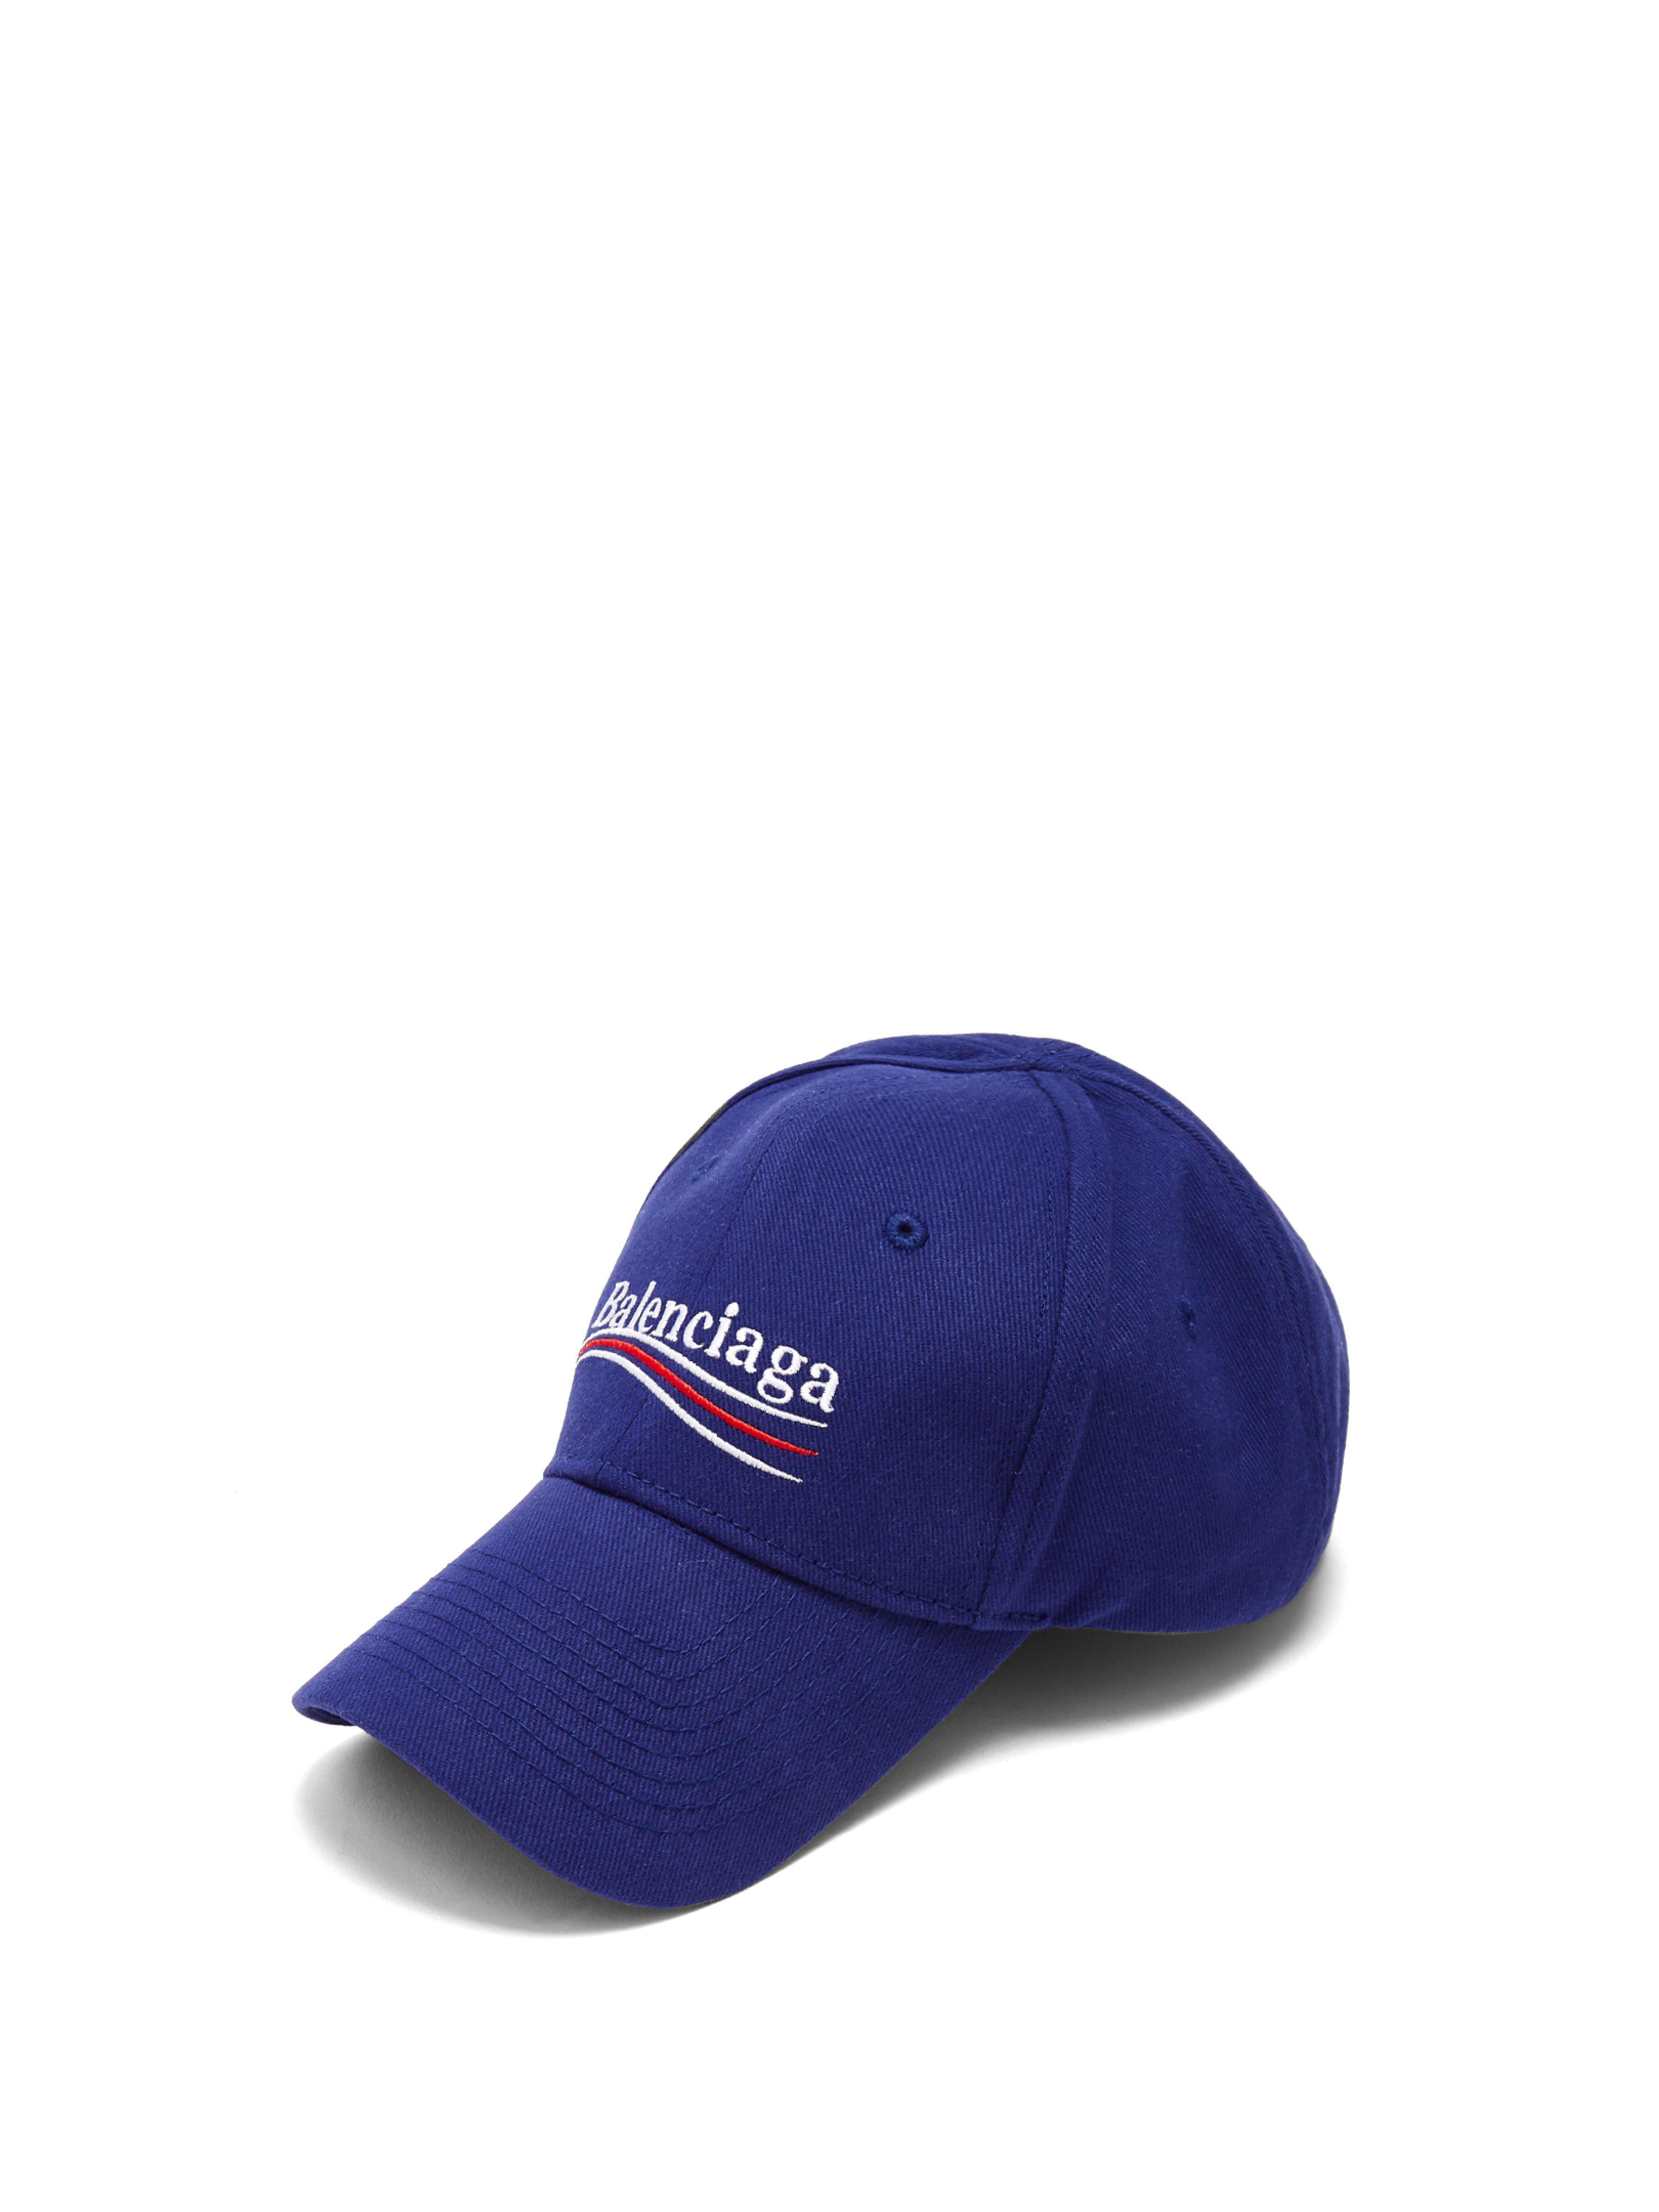 497744502f9 Balenciaga - Blue Embroidered Cotton-twill Baseball Cap - Lyst. View  fullscreen